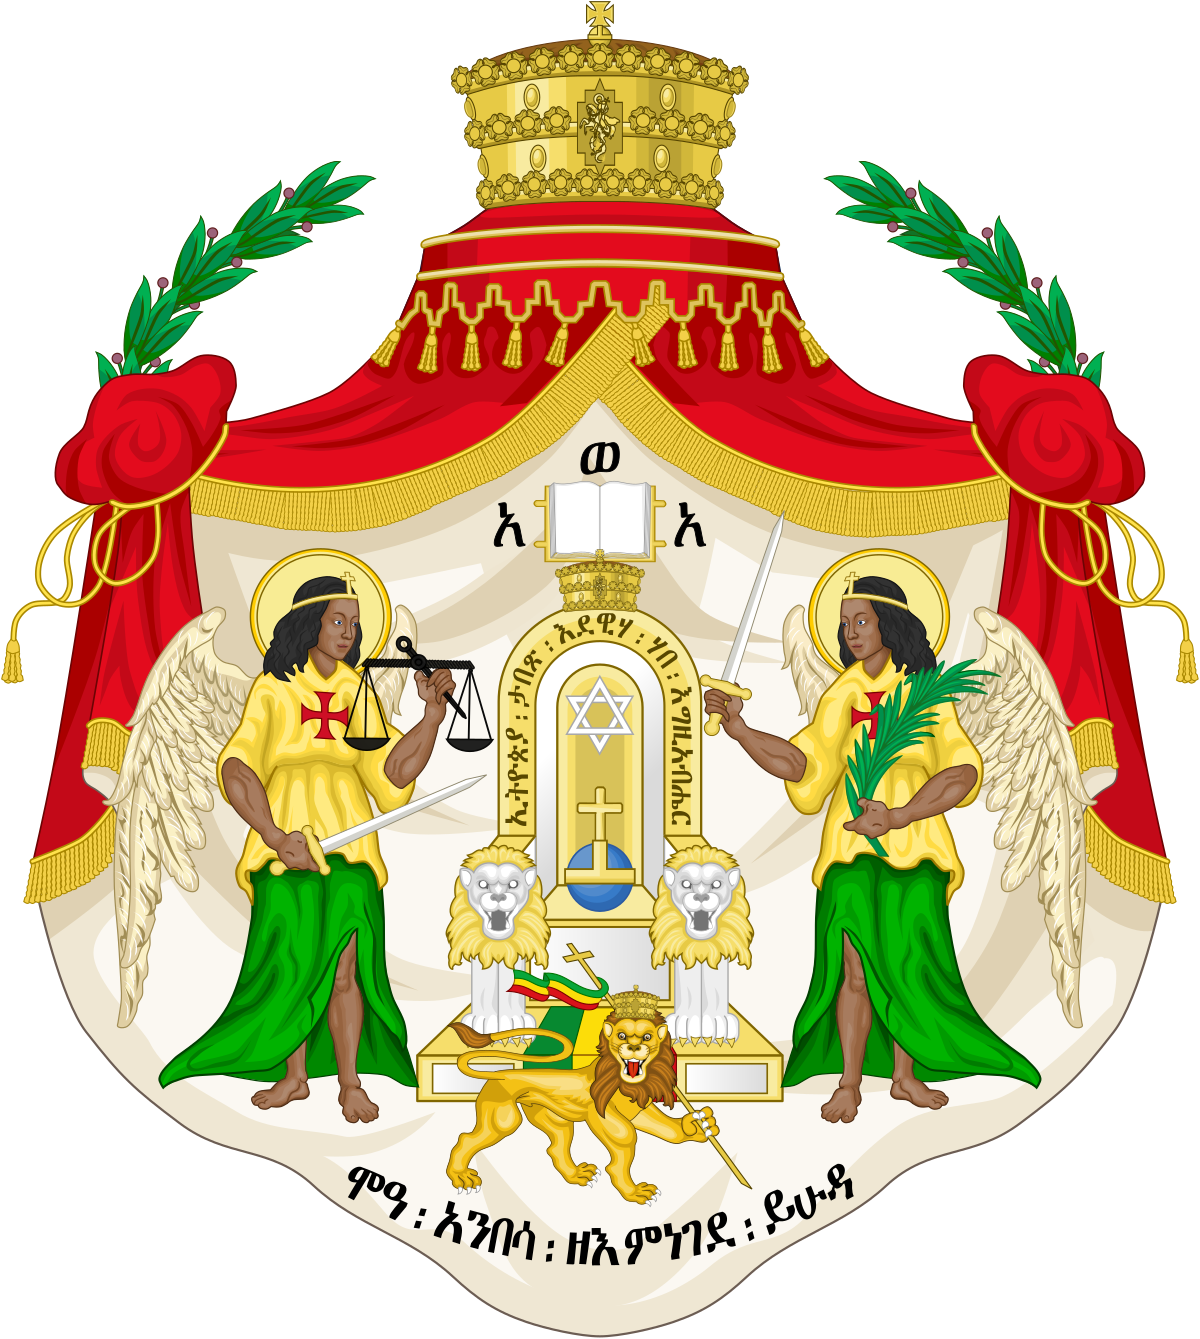 Emperor of ethiopia wikipedia. Clipart ruler king